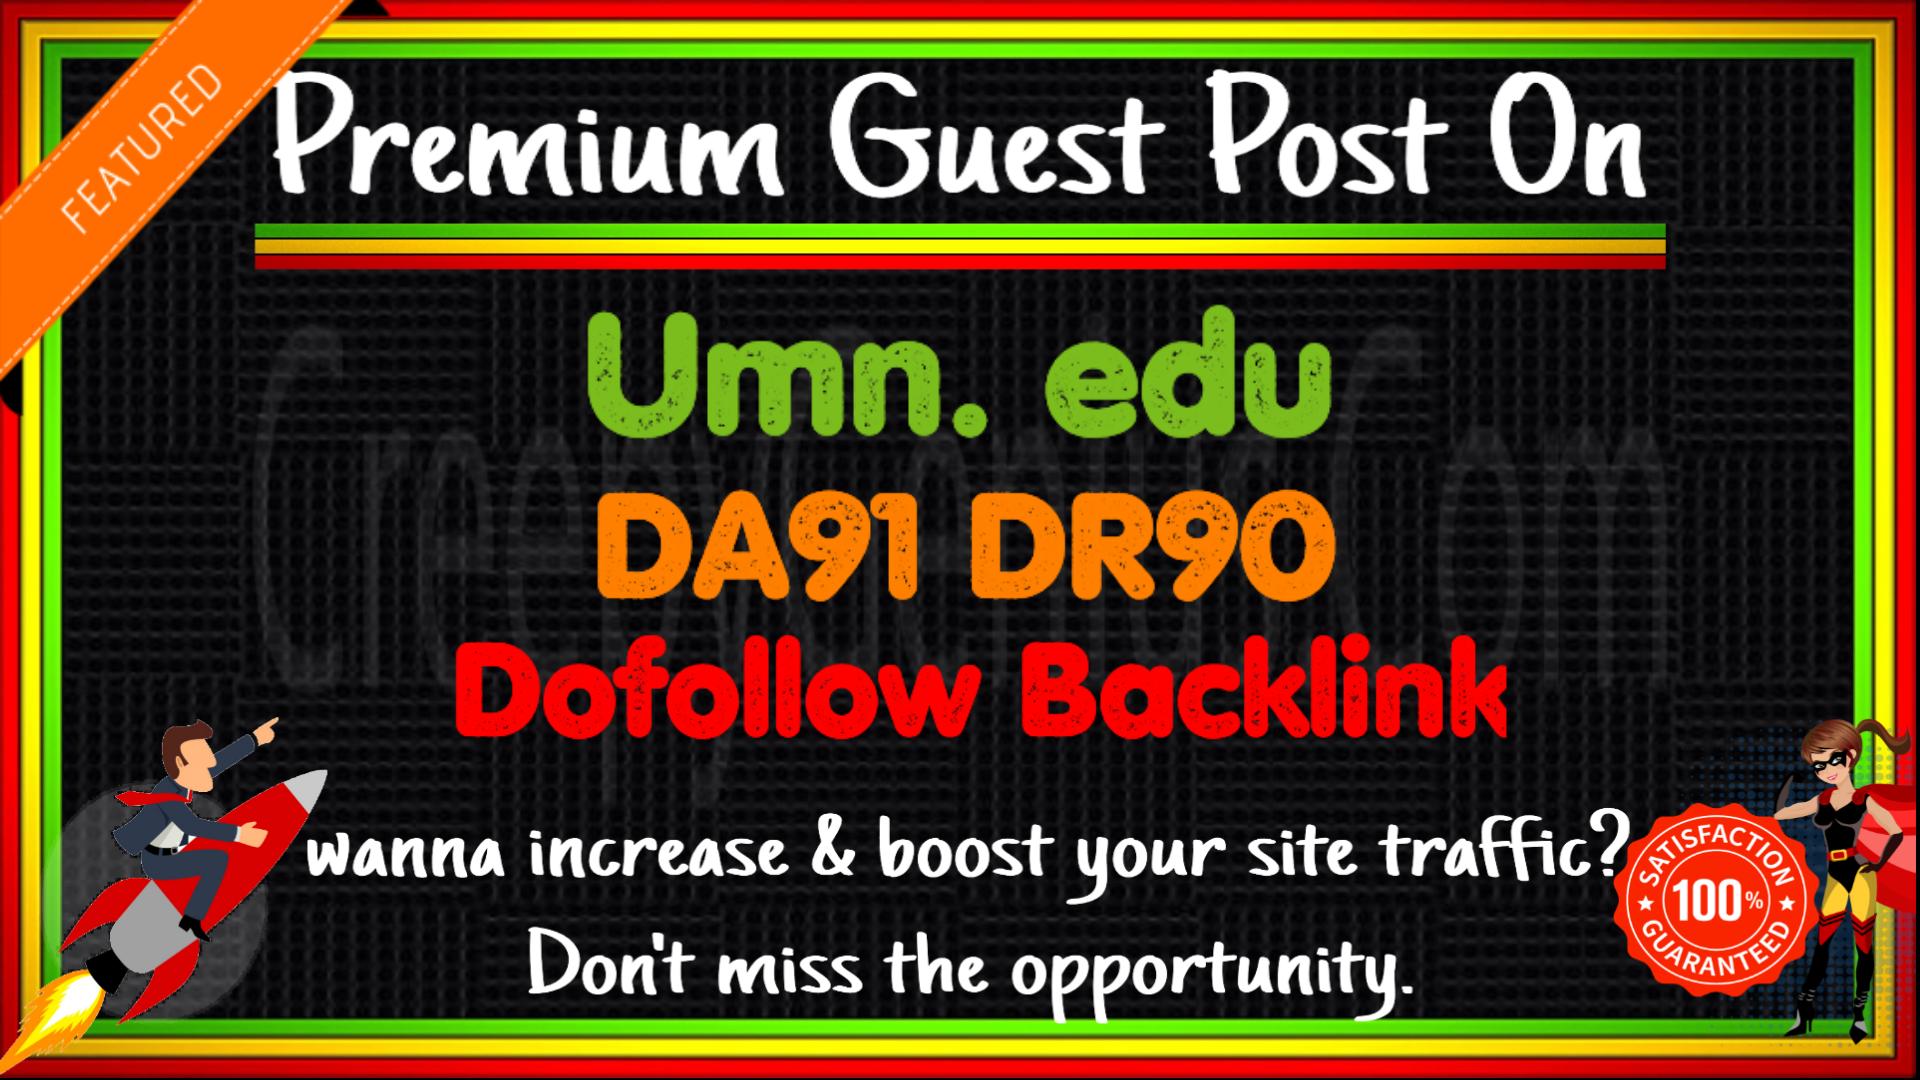 Guest Post on UMN. edu - The University of Minnesota - DA91